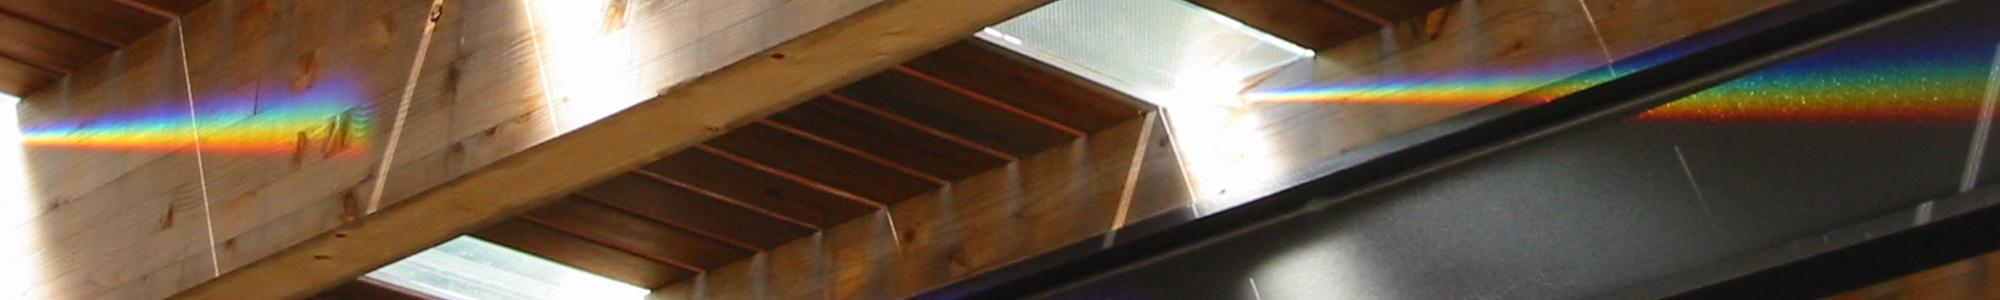 Peeling Away Layers - Pirie Associate Architects Blog